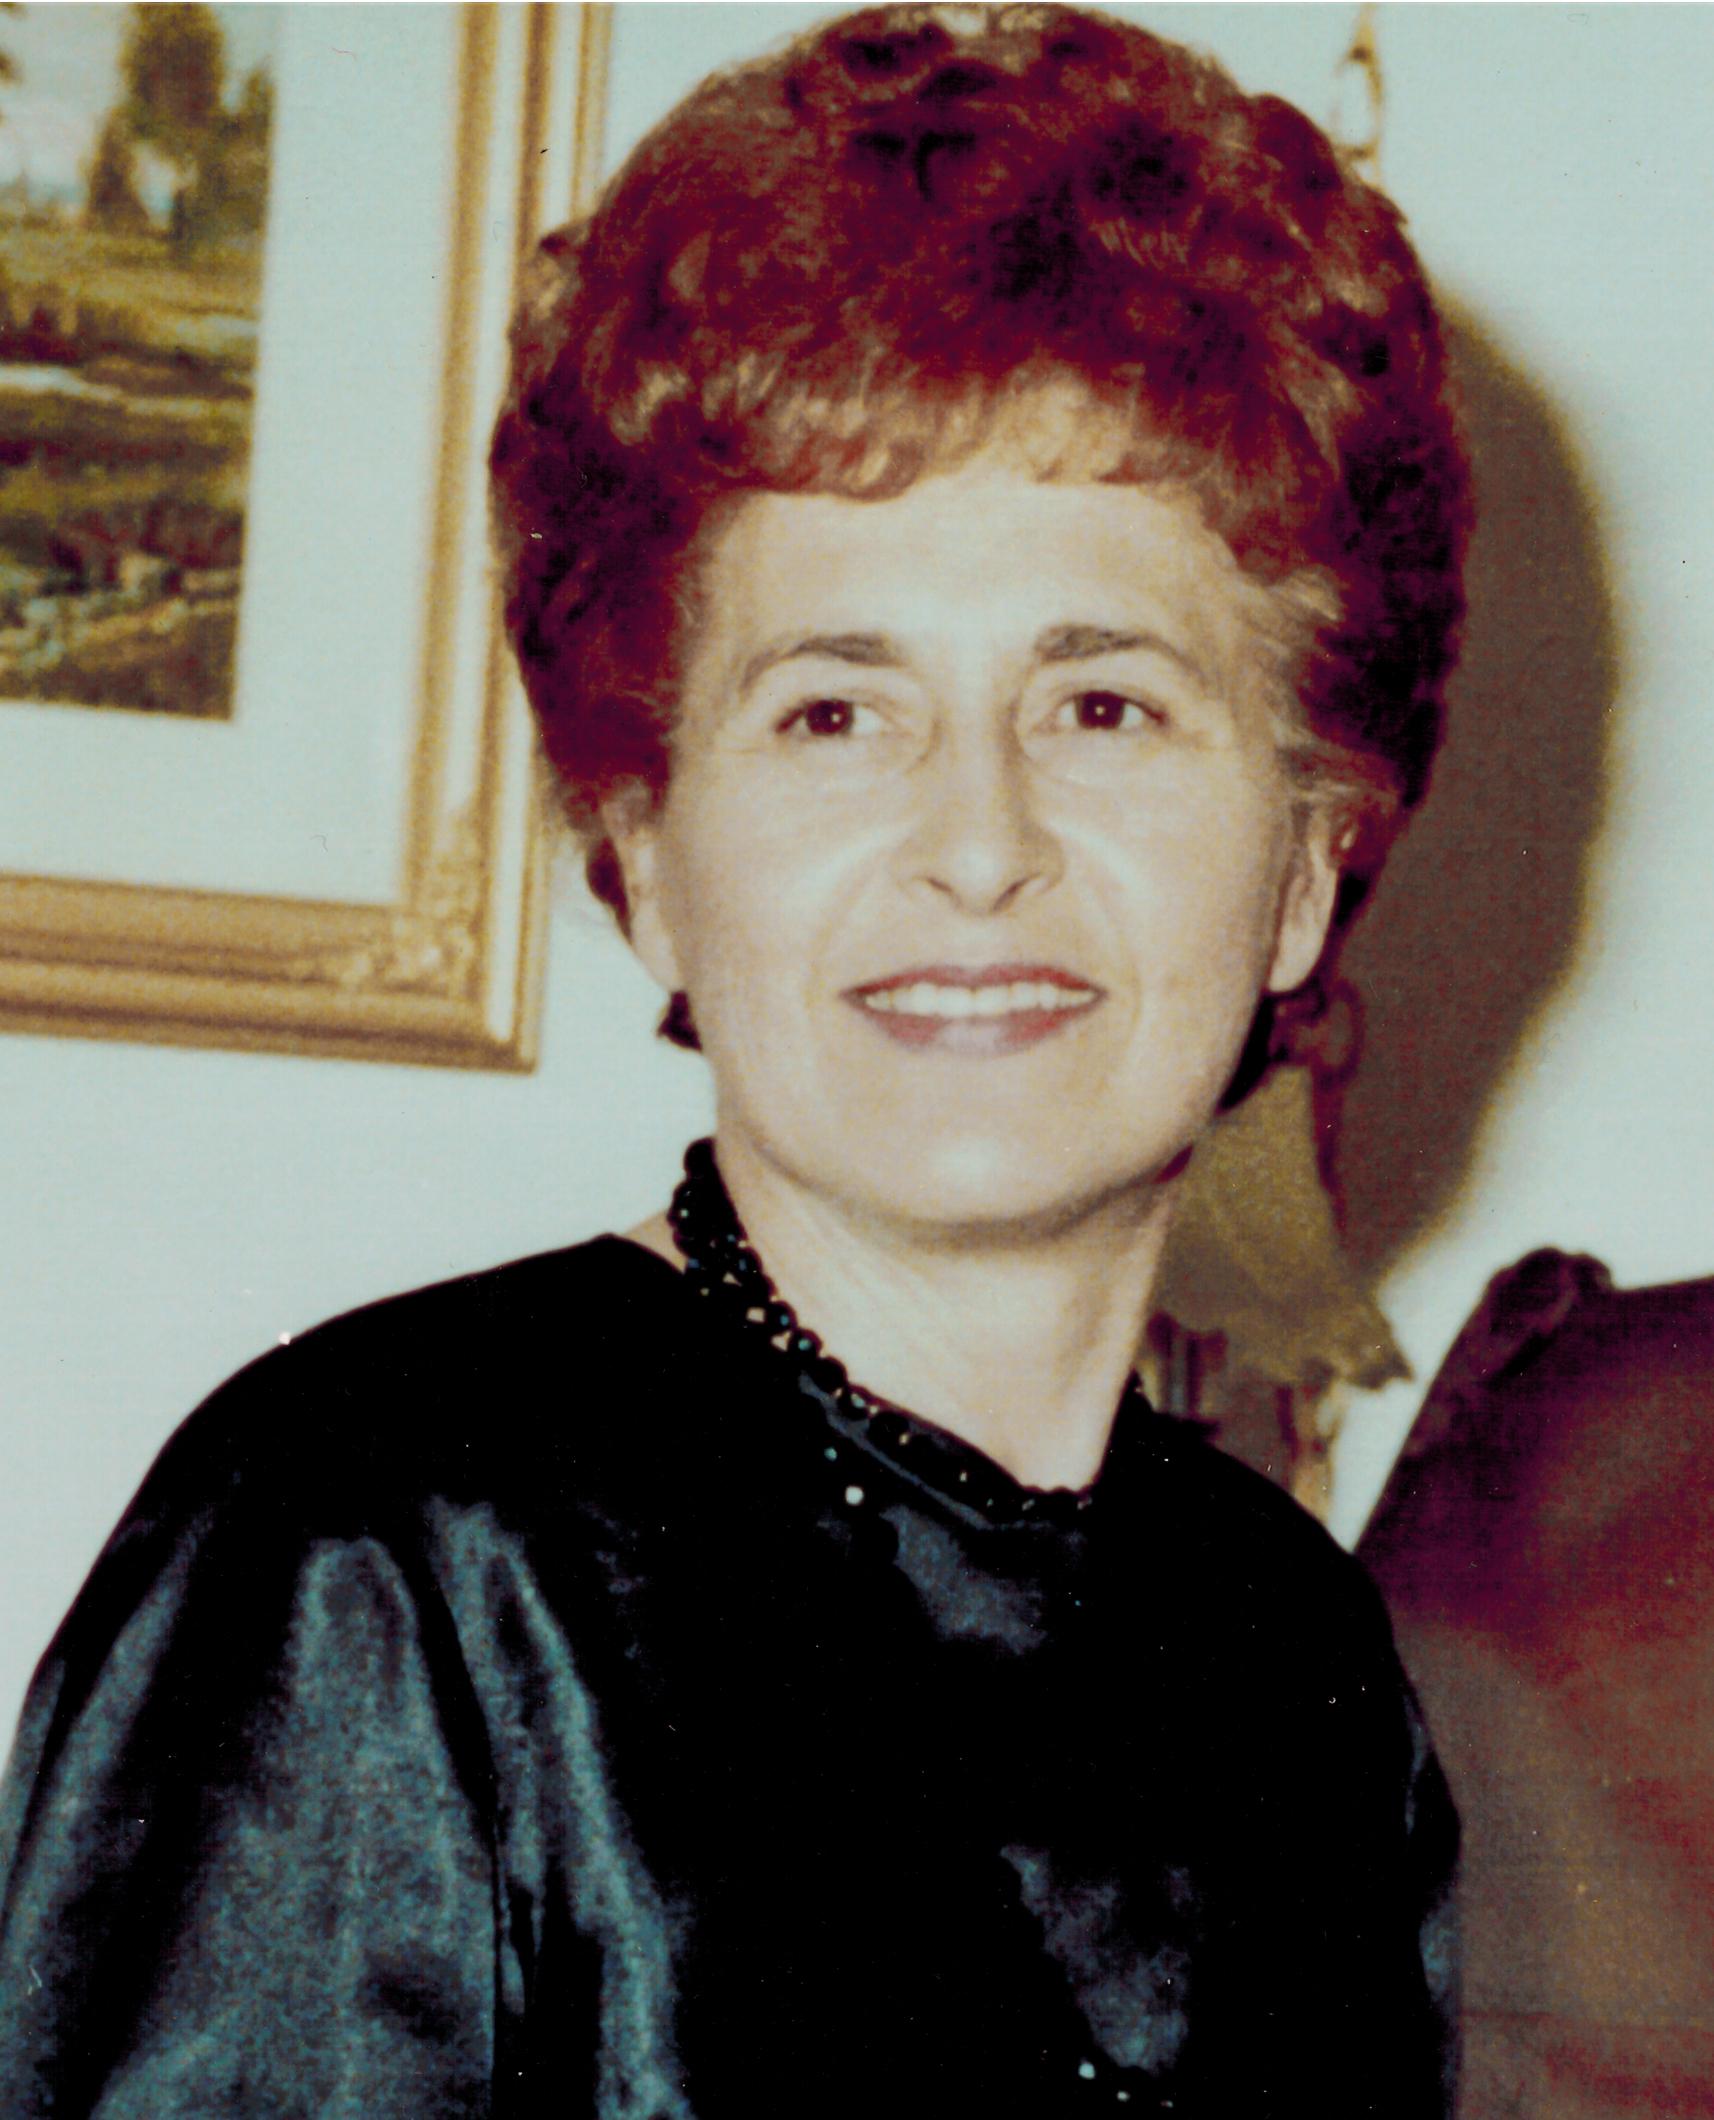 Ione Maxine Ballestrasse